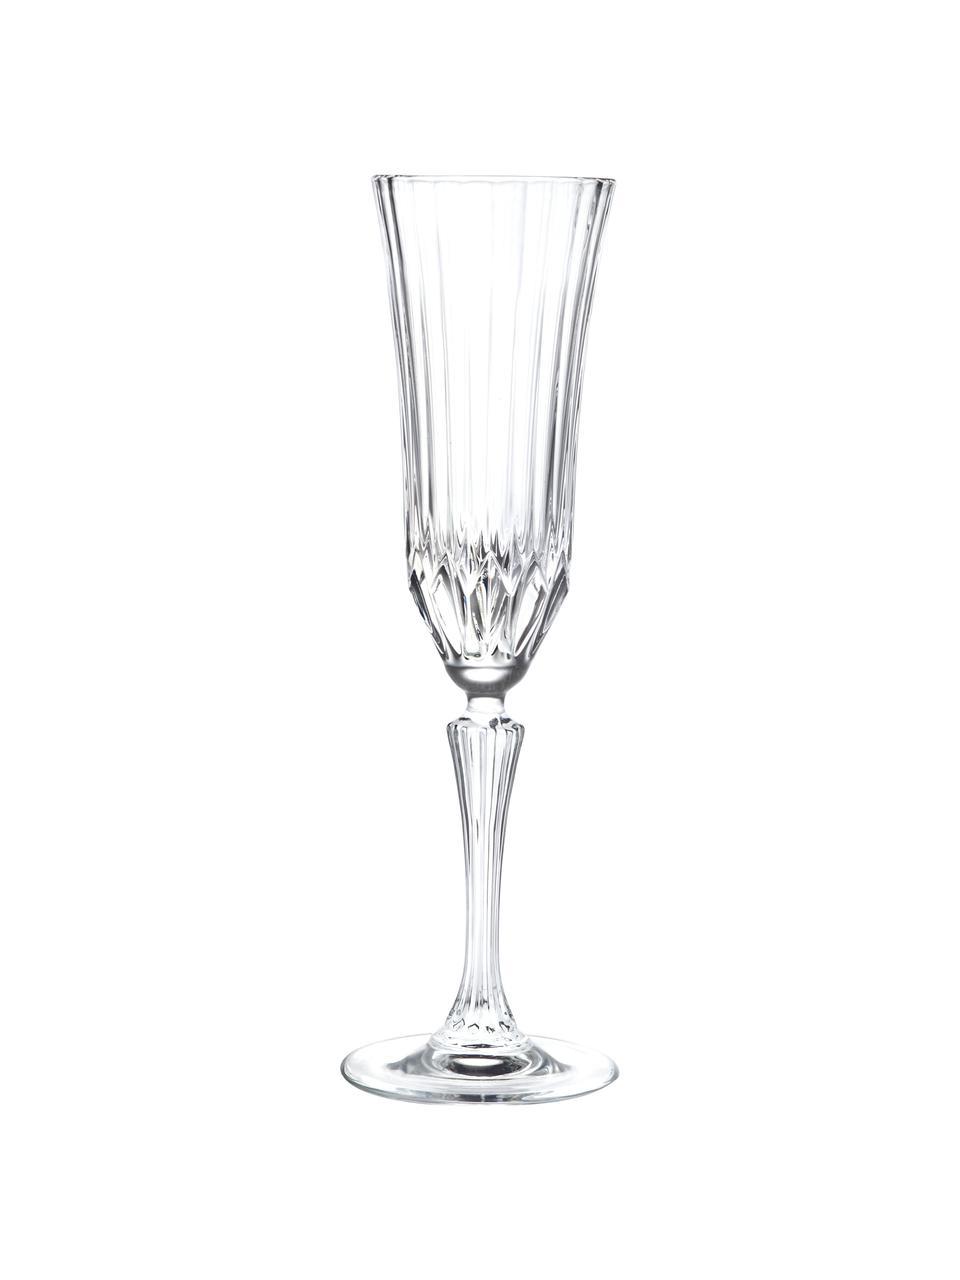 Kristall-Sektgläser Adagio mit Relief, 6 Stück, Kristallglas, Transparent, Ø 8 x H 25 cm